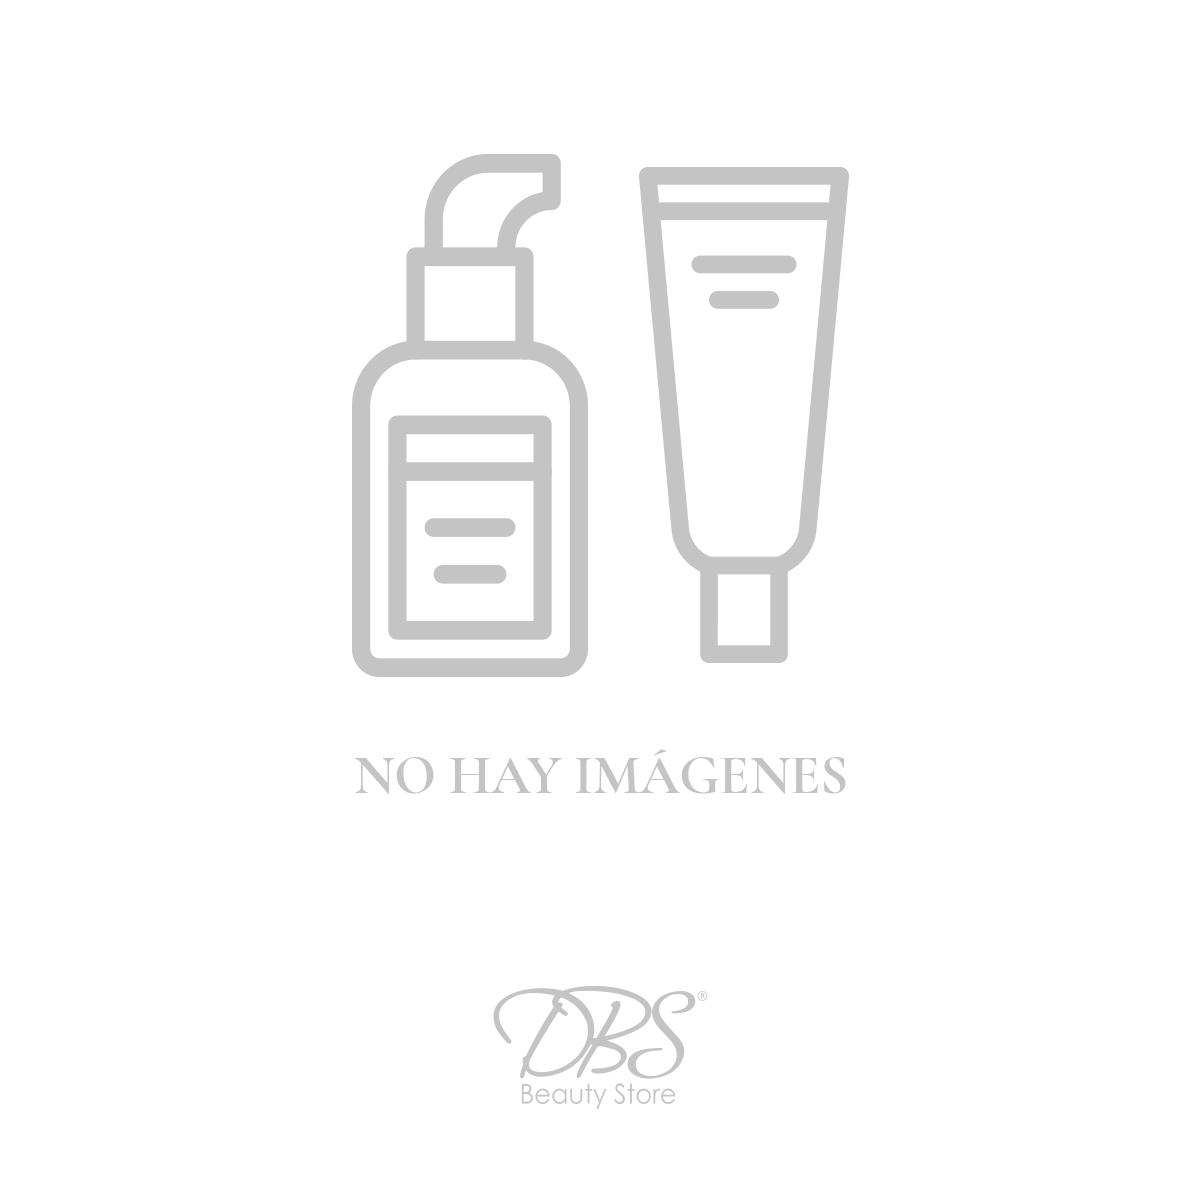 loreal-maquillaje-LO-99201.jpg